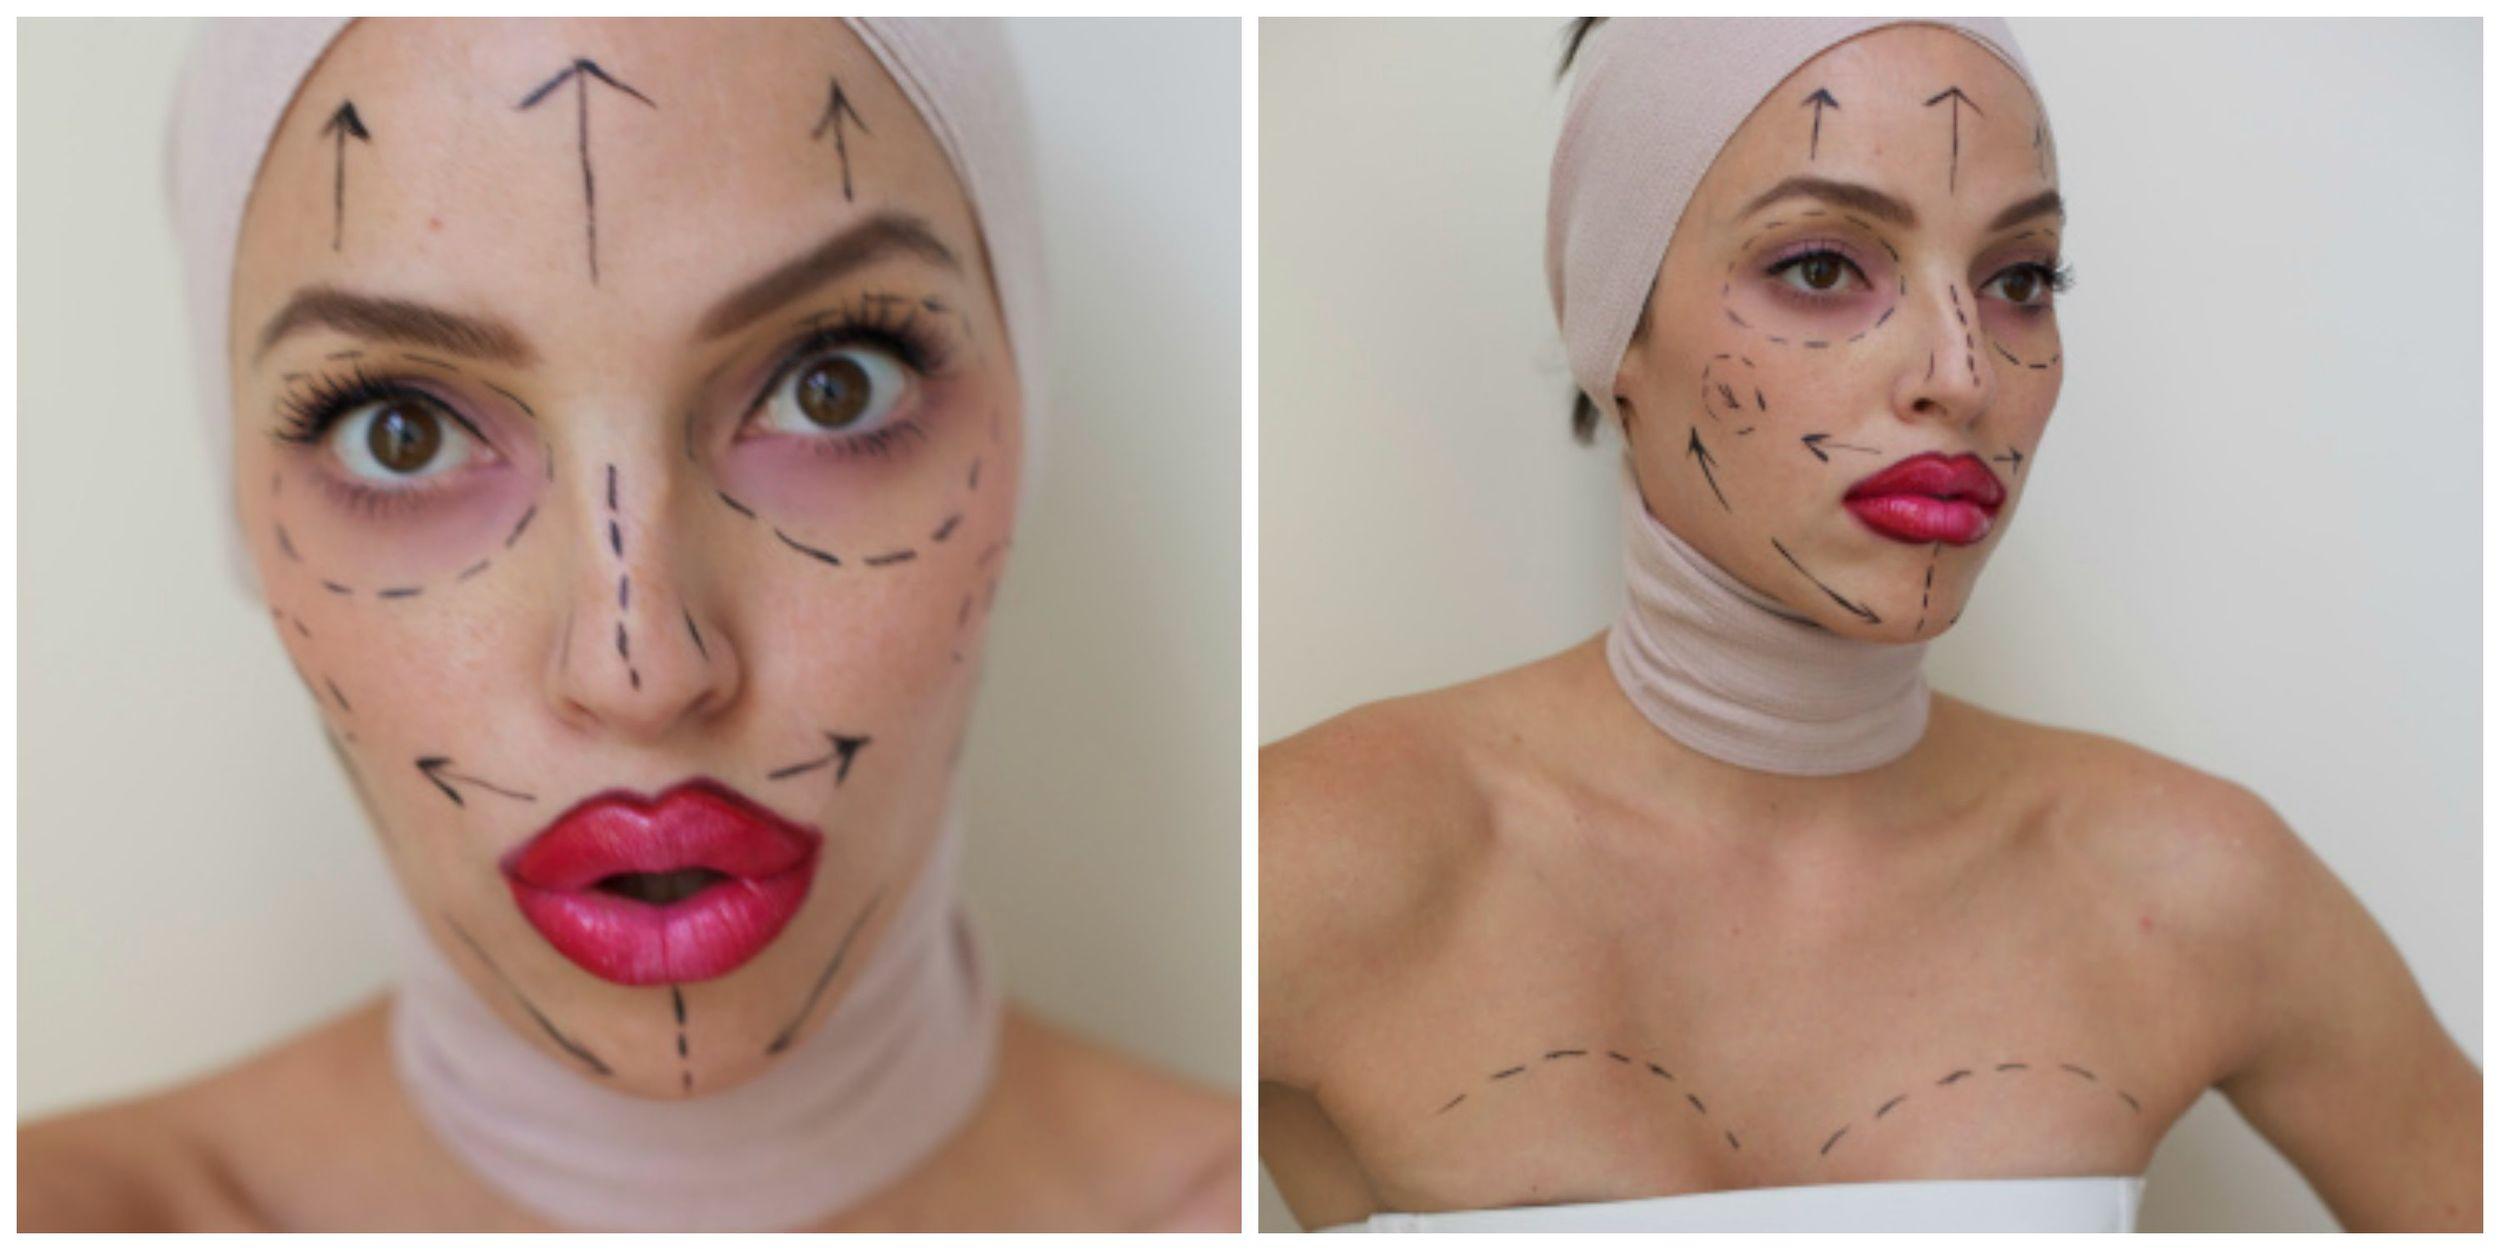 halloween-makeup-plastic-surgery-costume.jpg